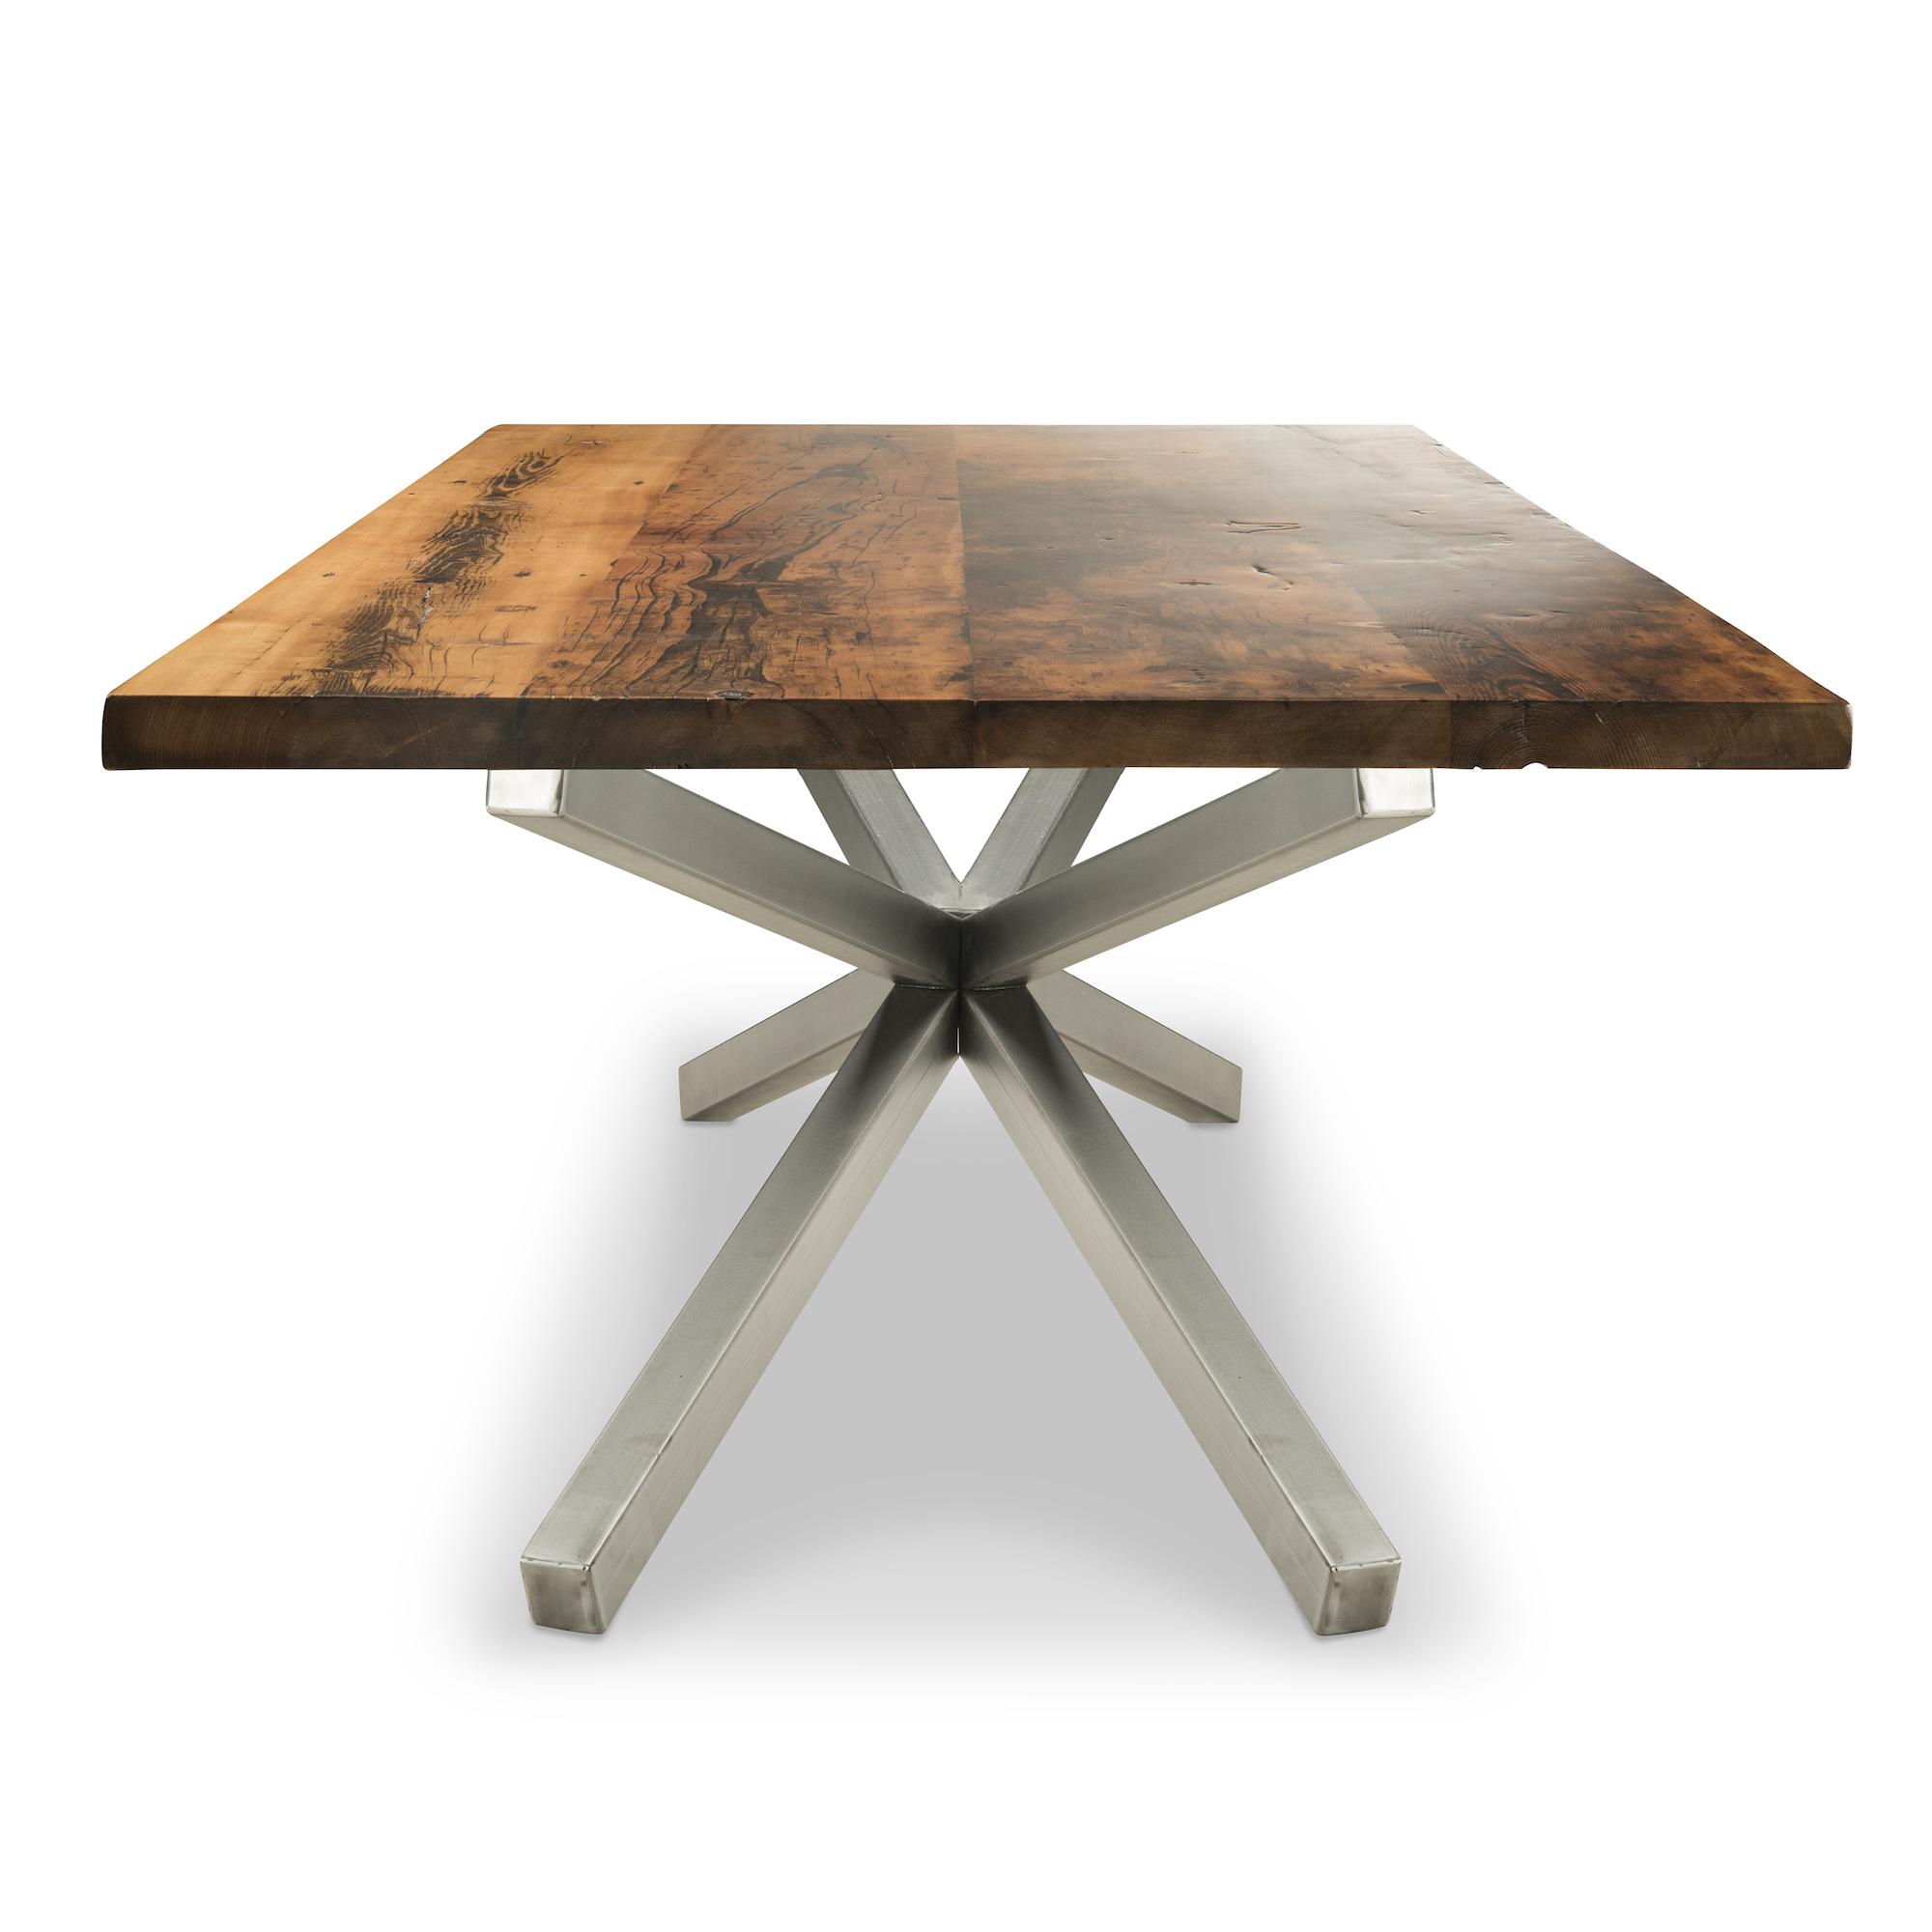 Austin_Table_End-1-1-1-1.jpg